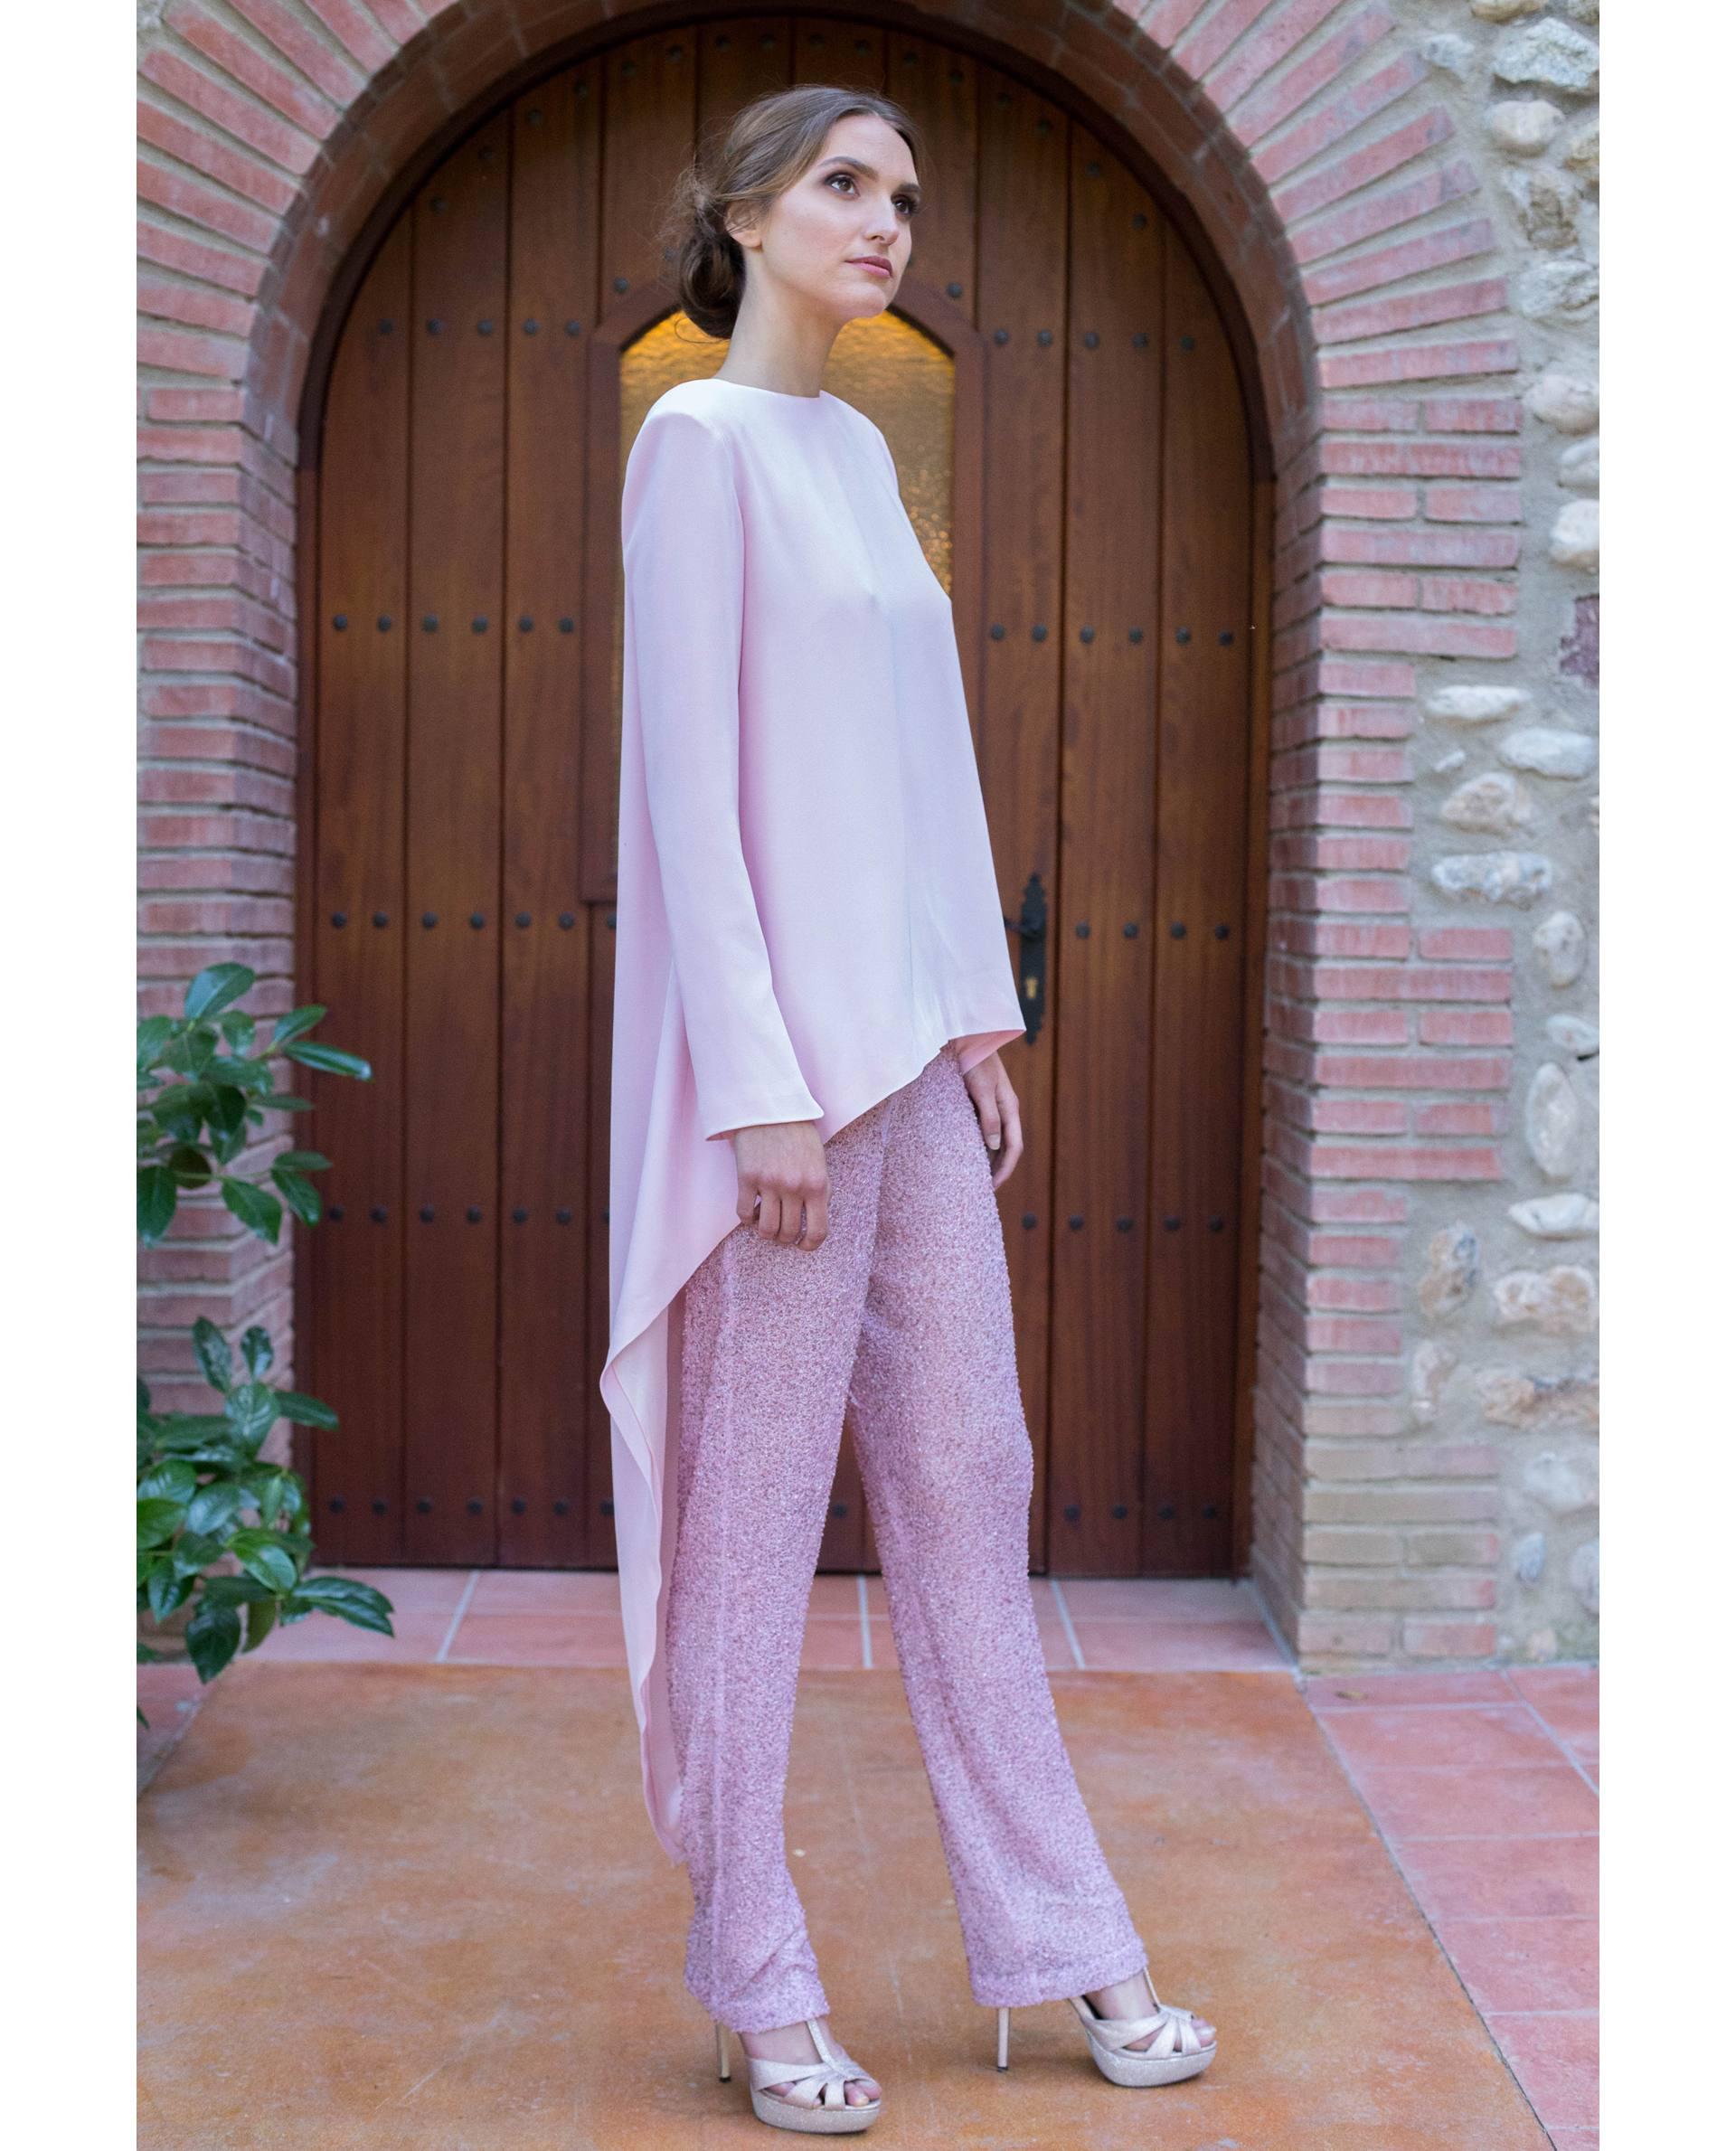 ATELIER-NATURE 2019 - BLUSAS - blusa fiesta andra rosa